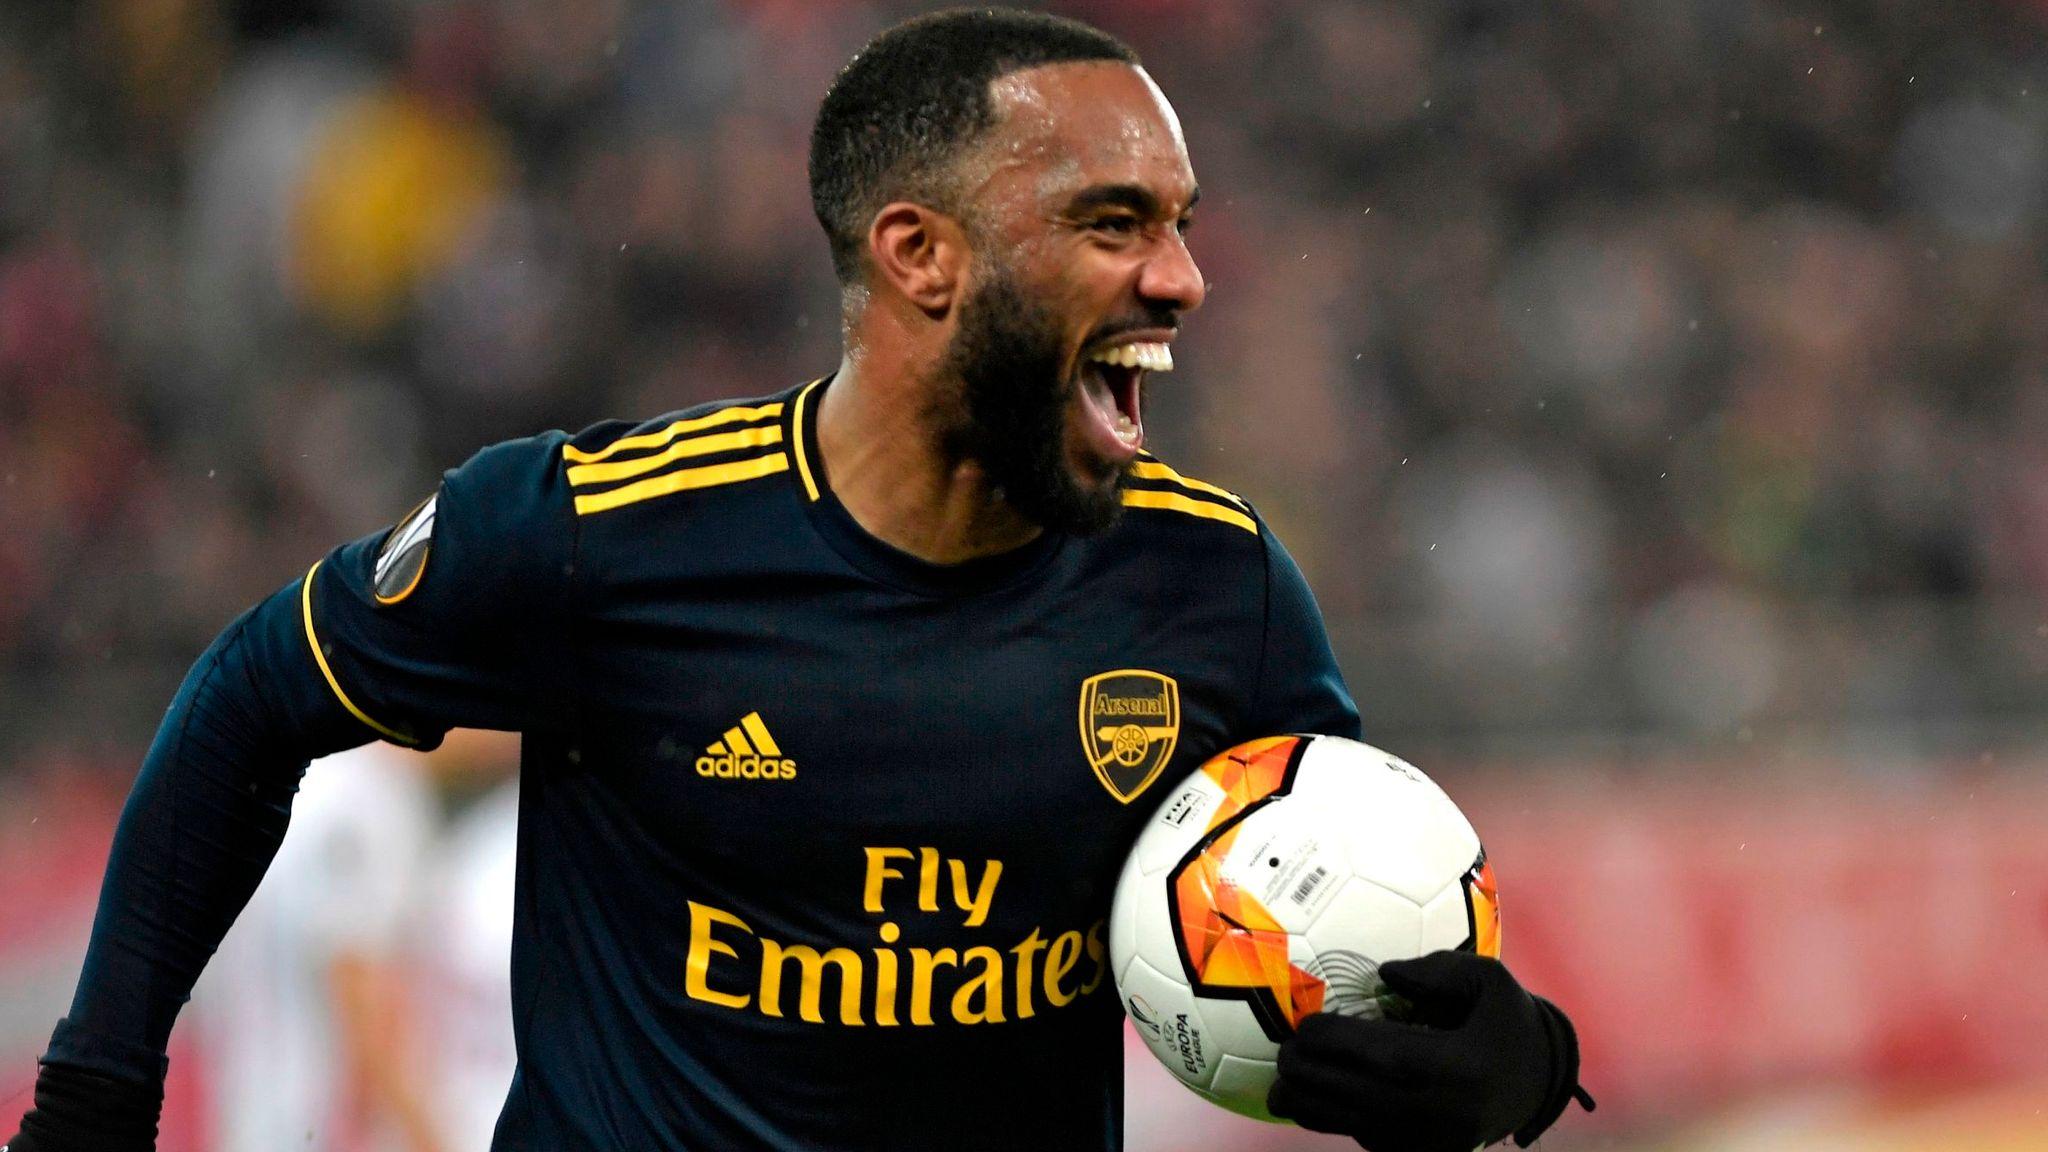 Olympiakos 0-1 Arsenal: Alexandre Lacazette gives Gunners Europa League last-32 advantage